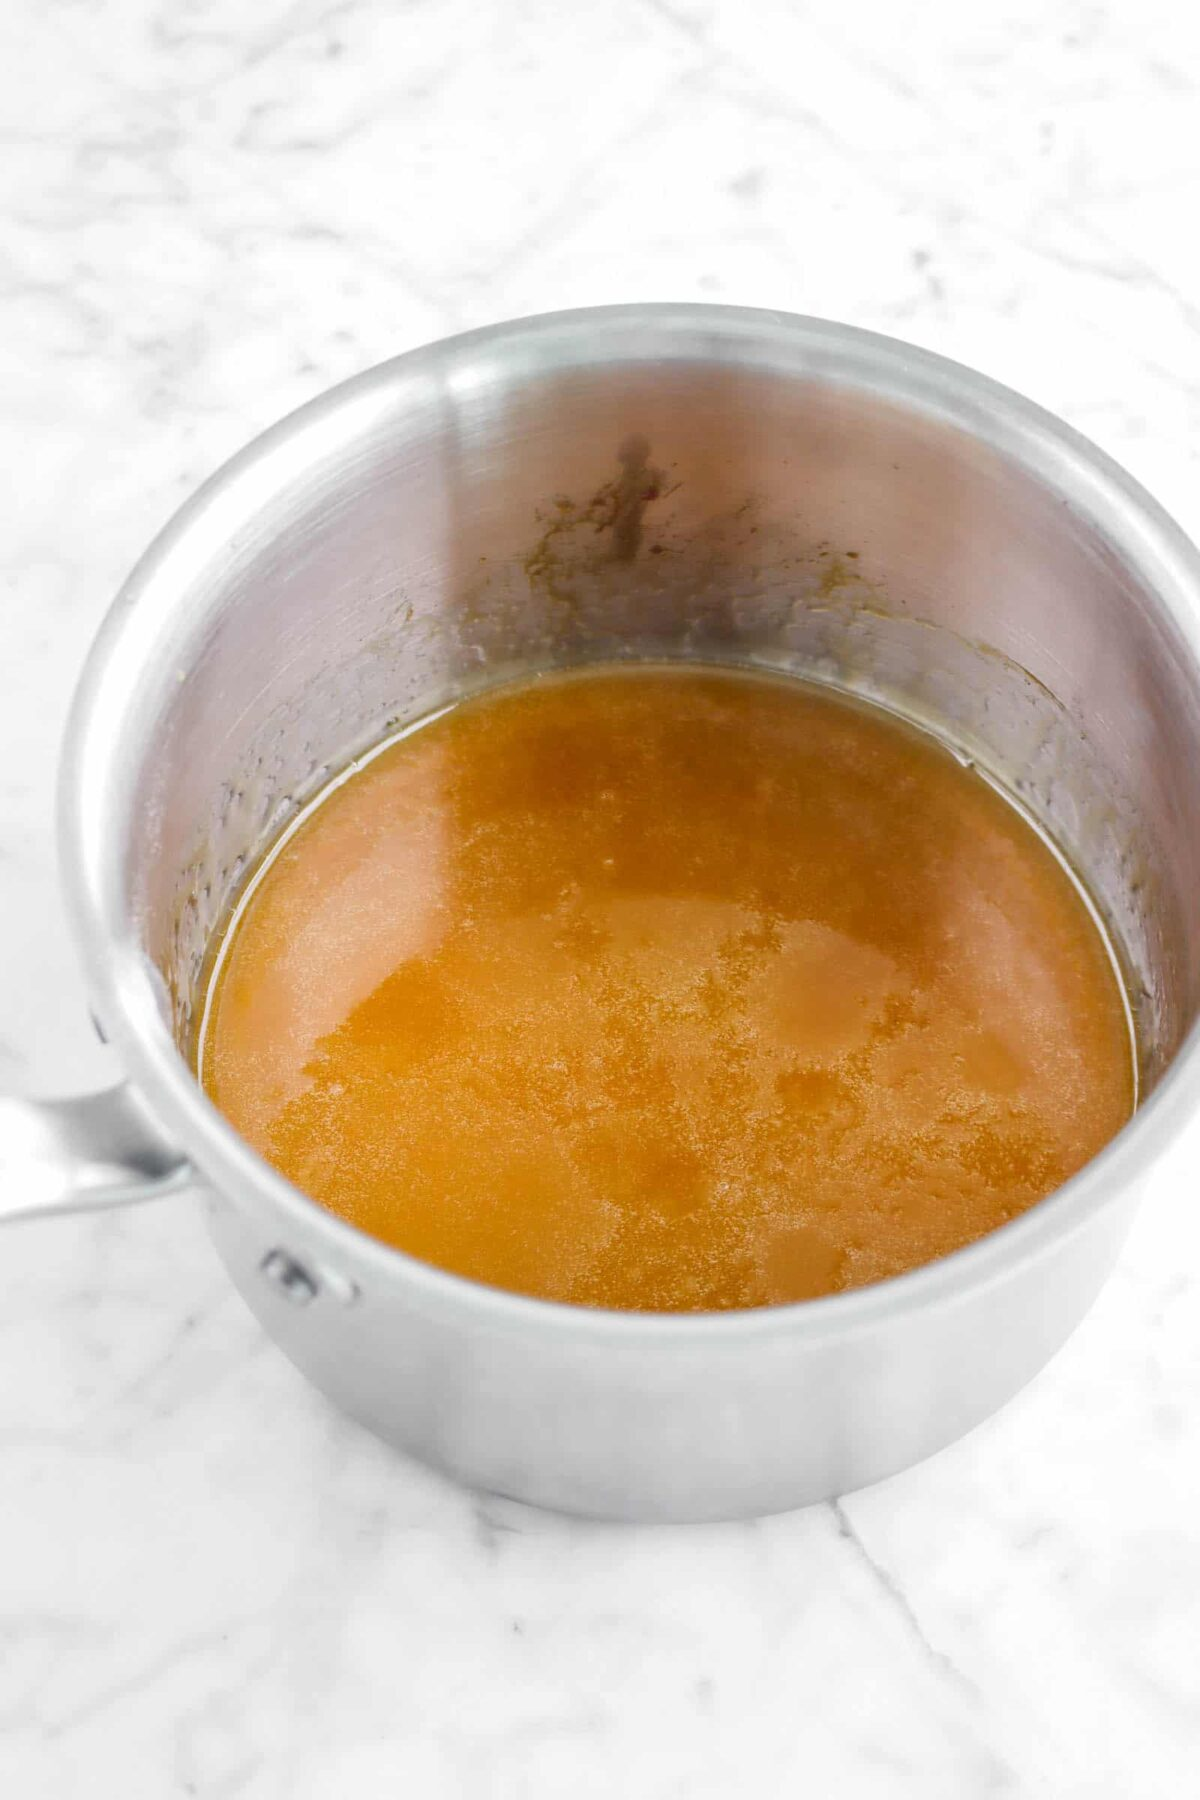 caramel in small pot